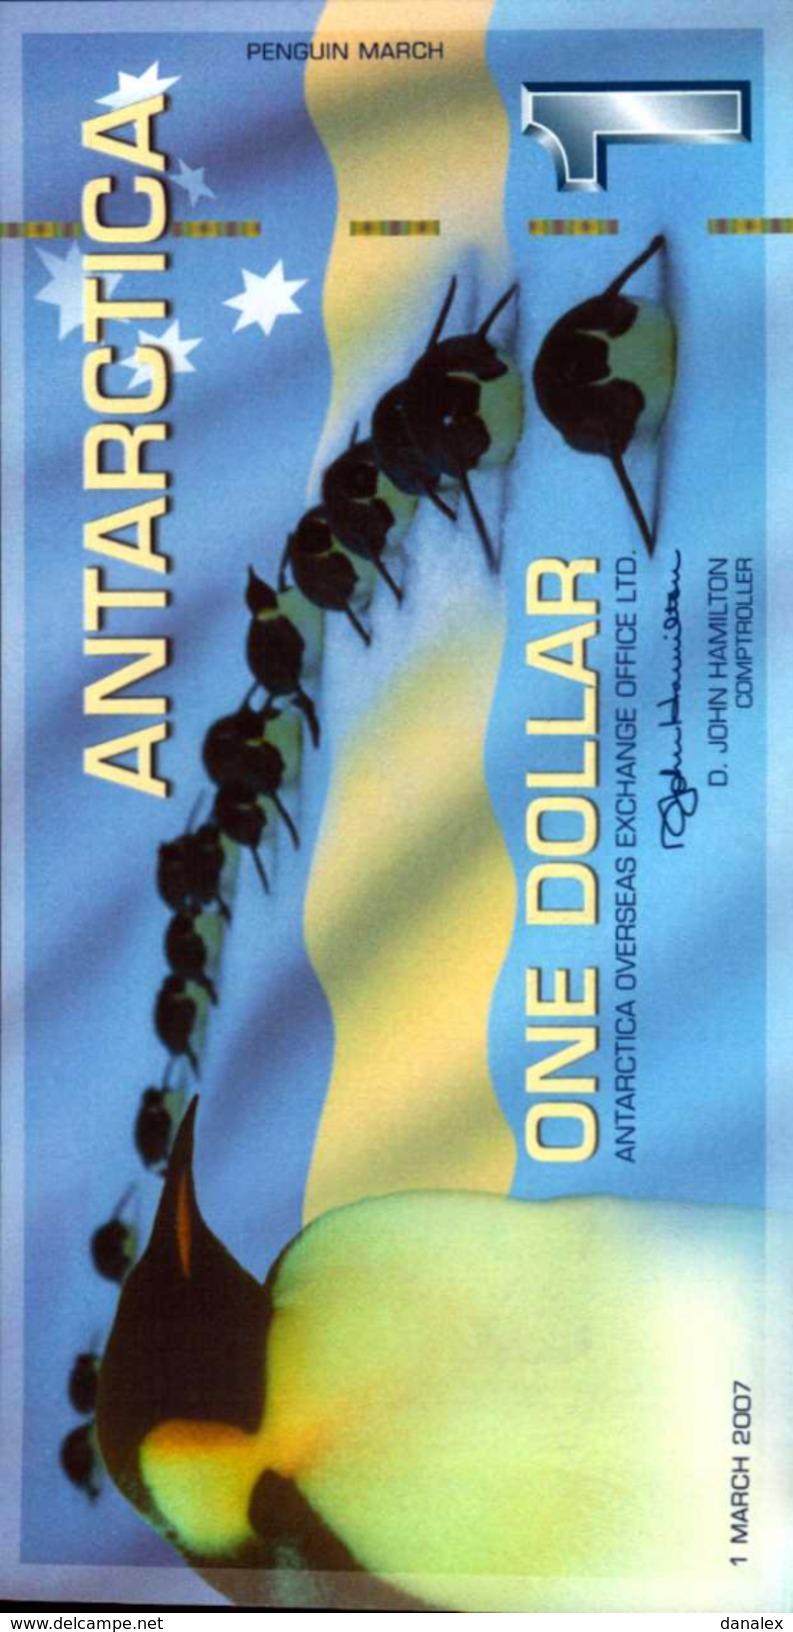 ANTARTIQUE 1 DOLLAR Du 1-3-2007  UNC/NEUF - Billets